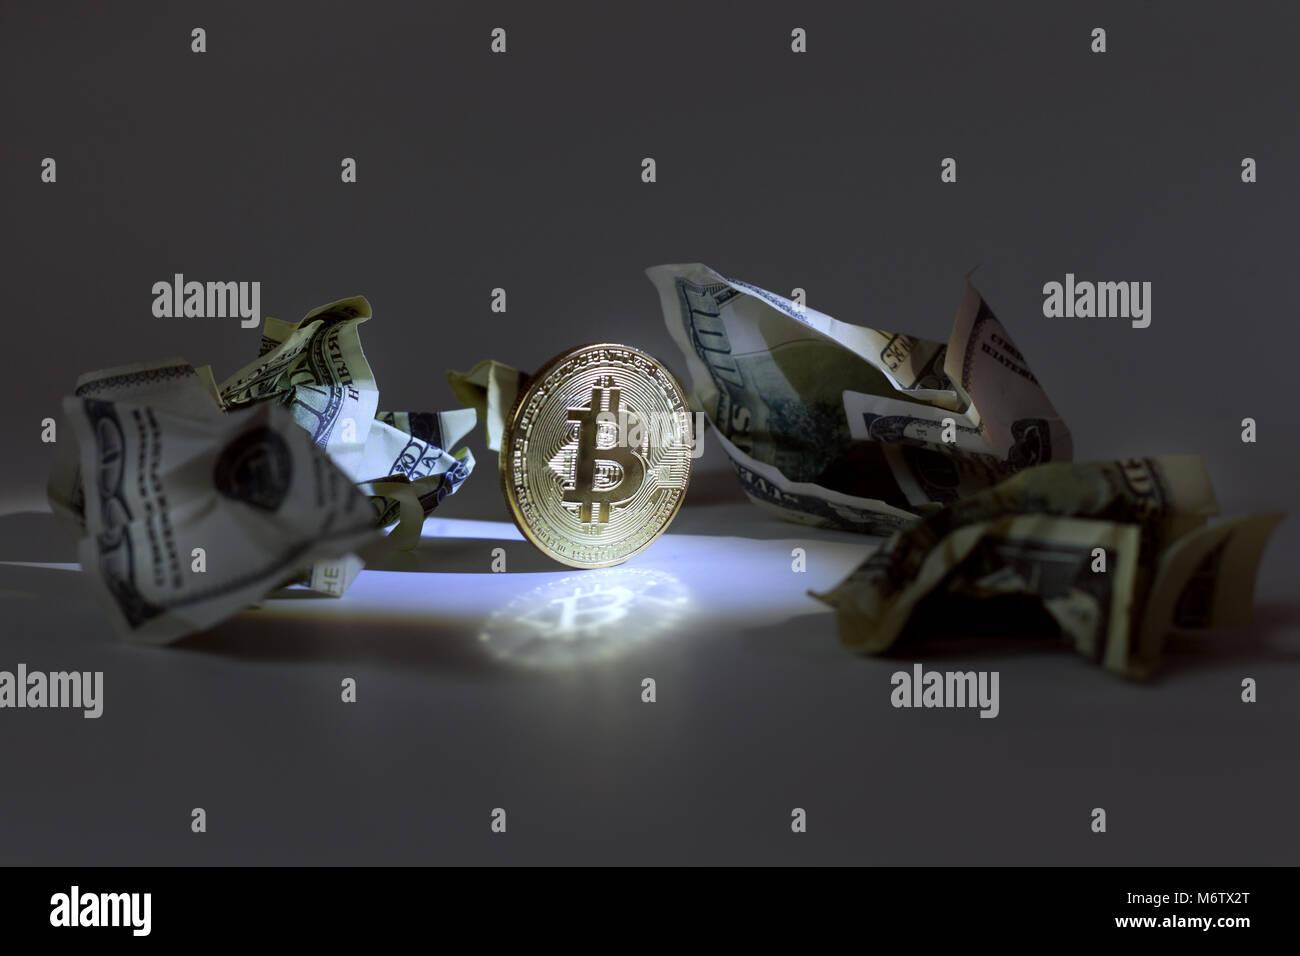 Gold coin bitcoin among crumpled dollar bills. - Stock Image